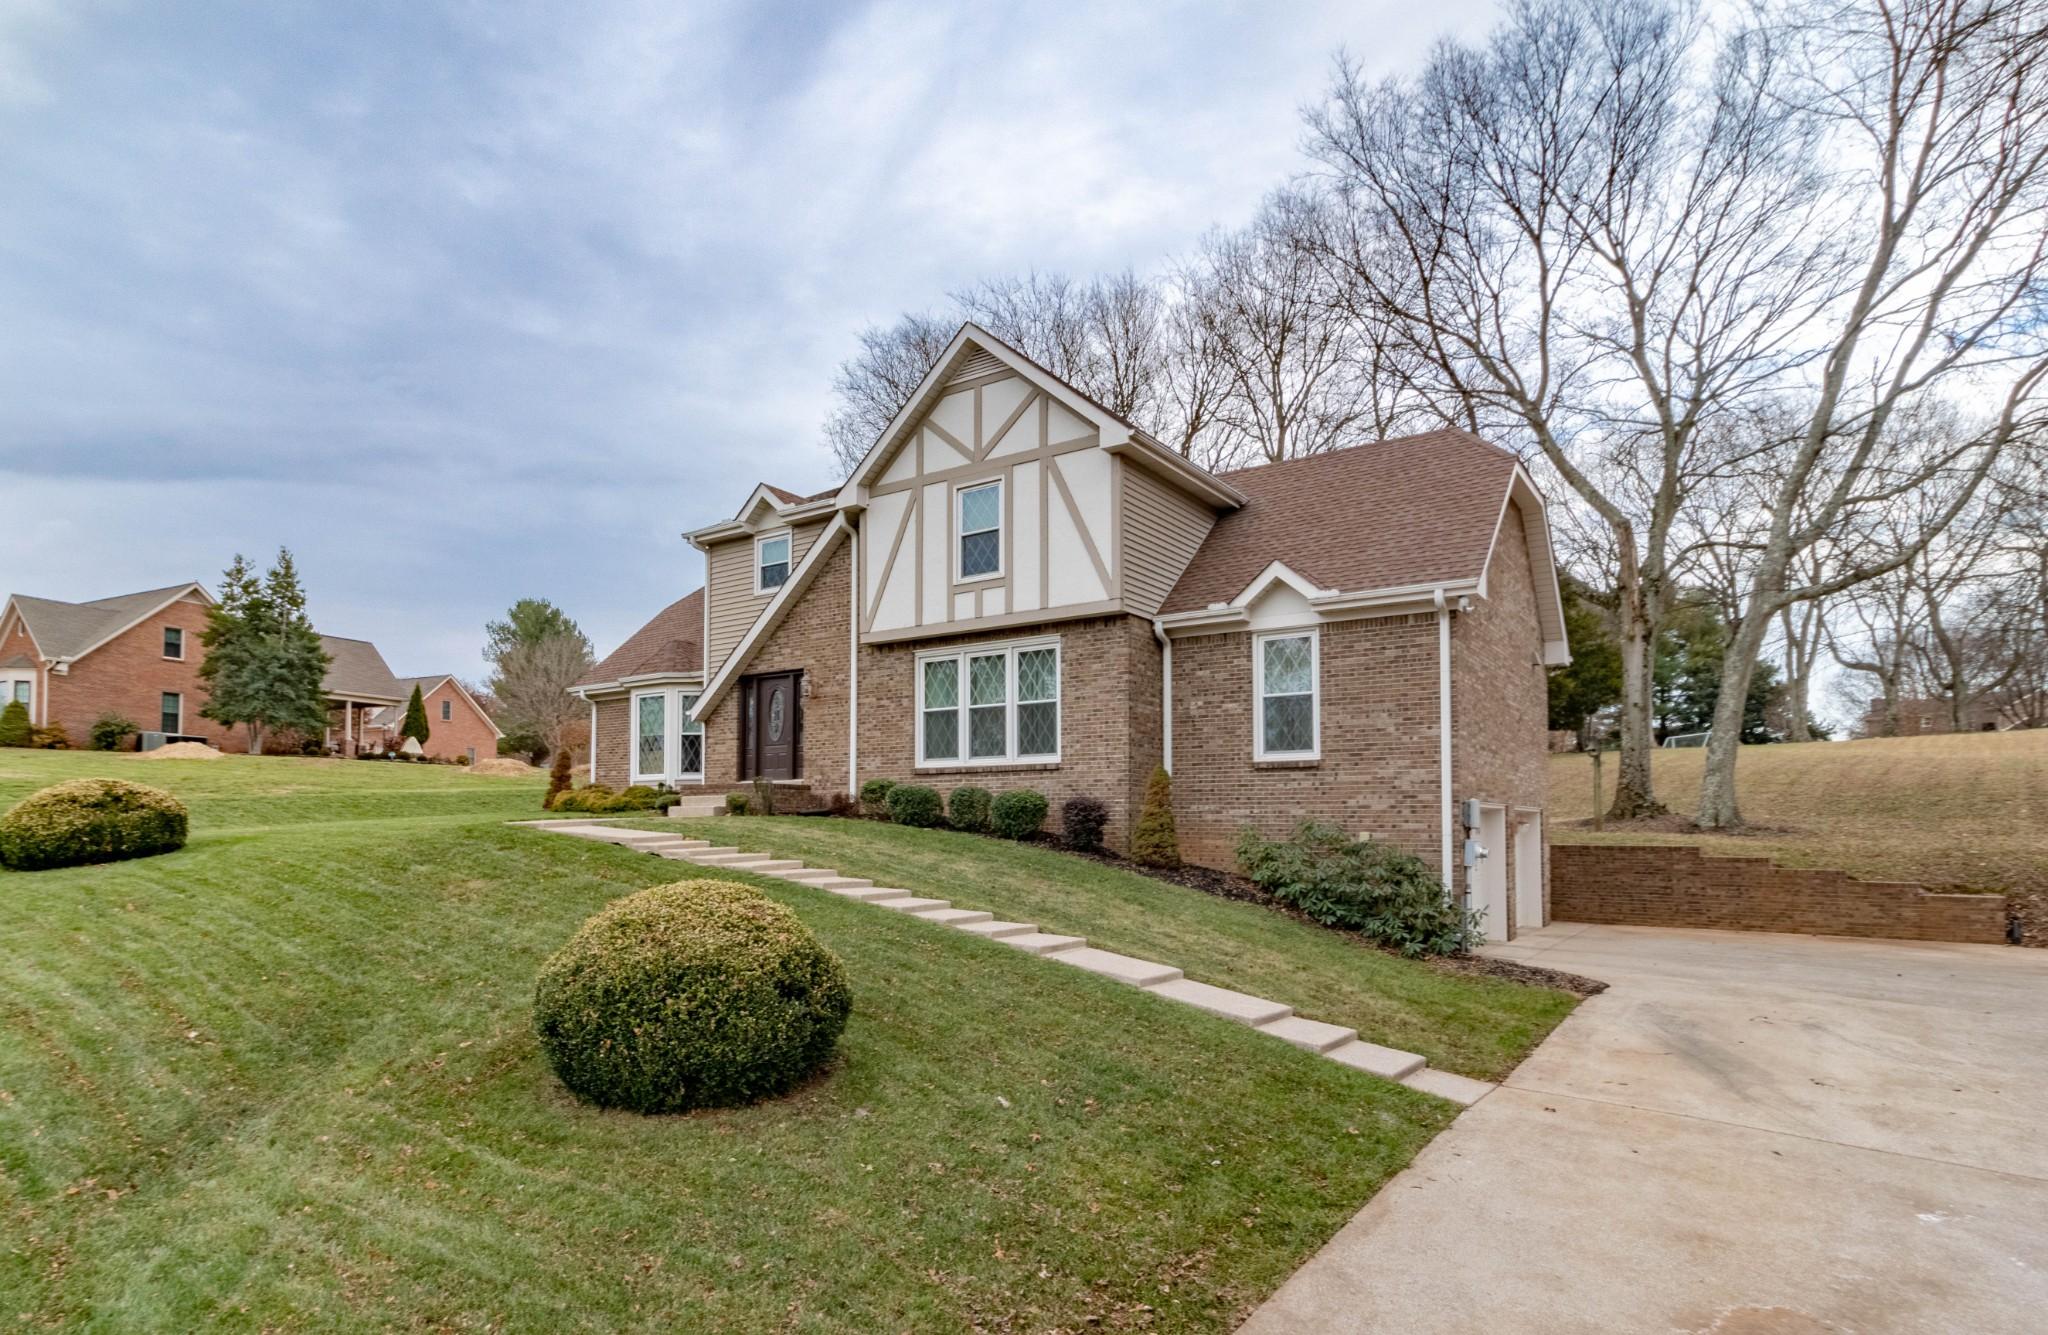 409 Stonemeadow Rd, Clarksville, TN 37043 - Clarksville, TN real estate listing